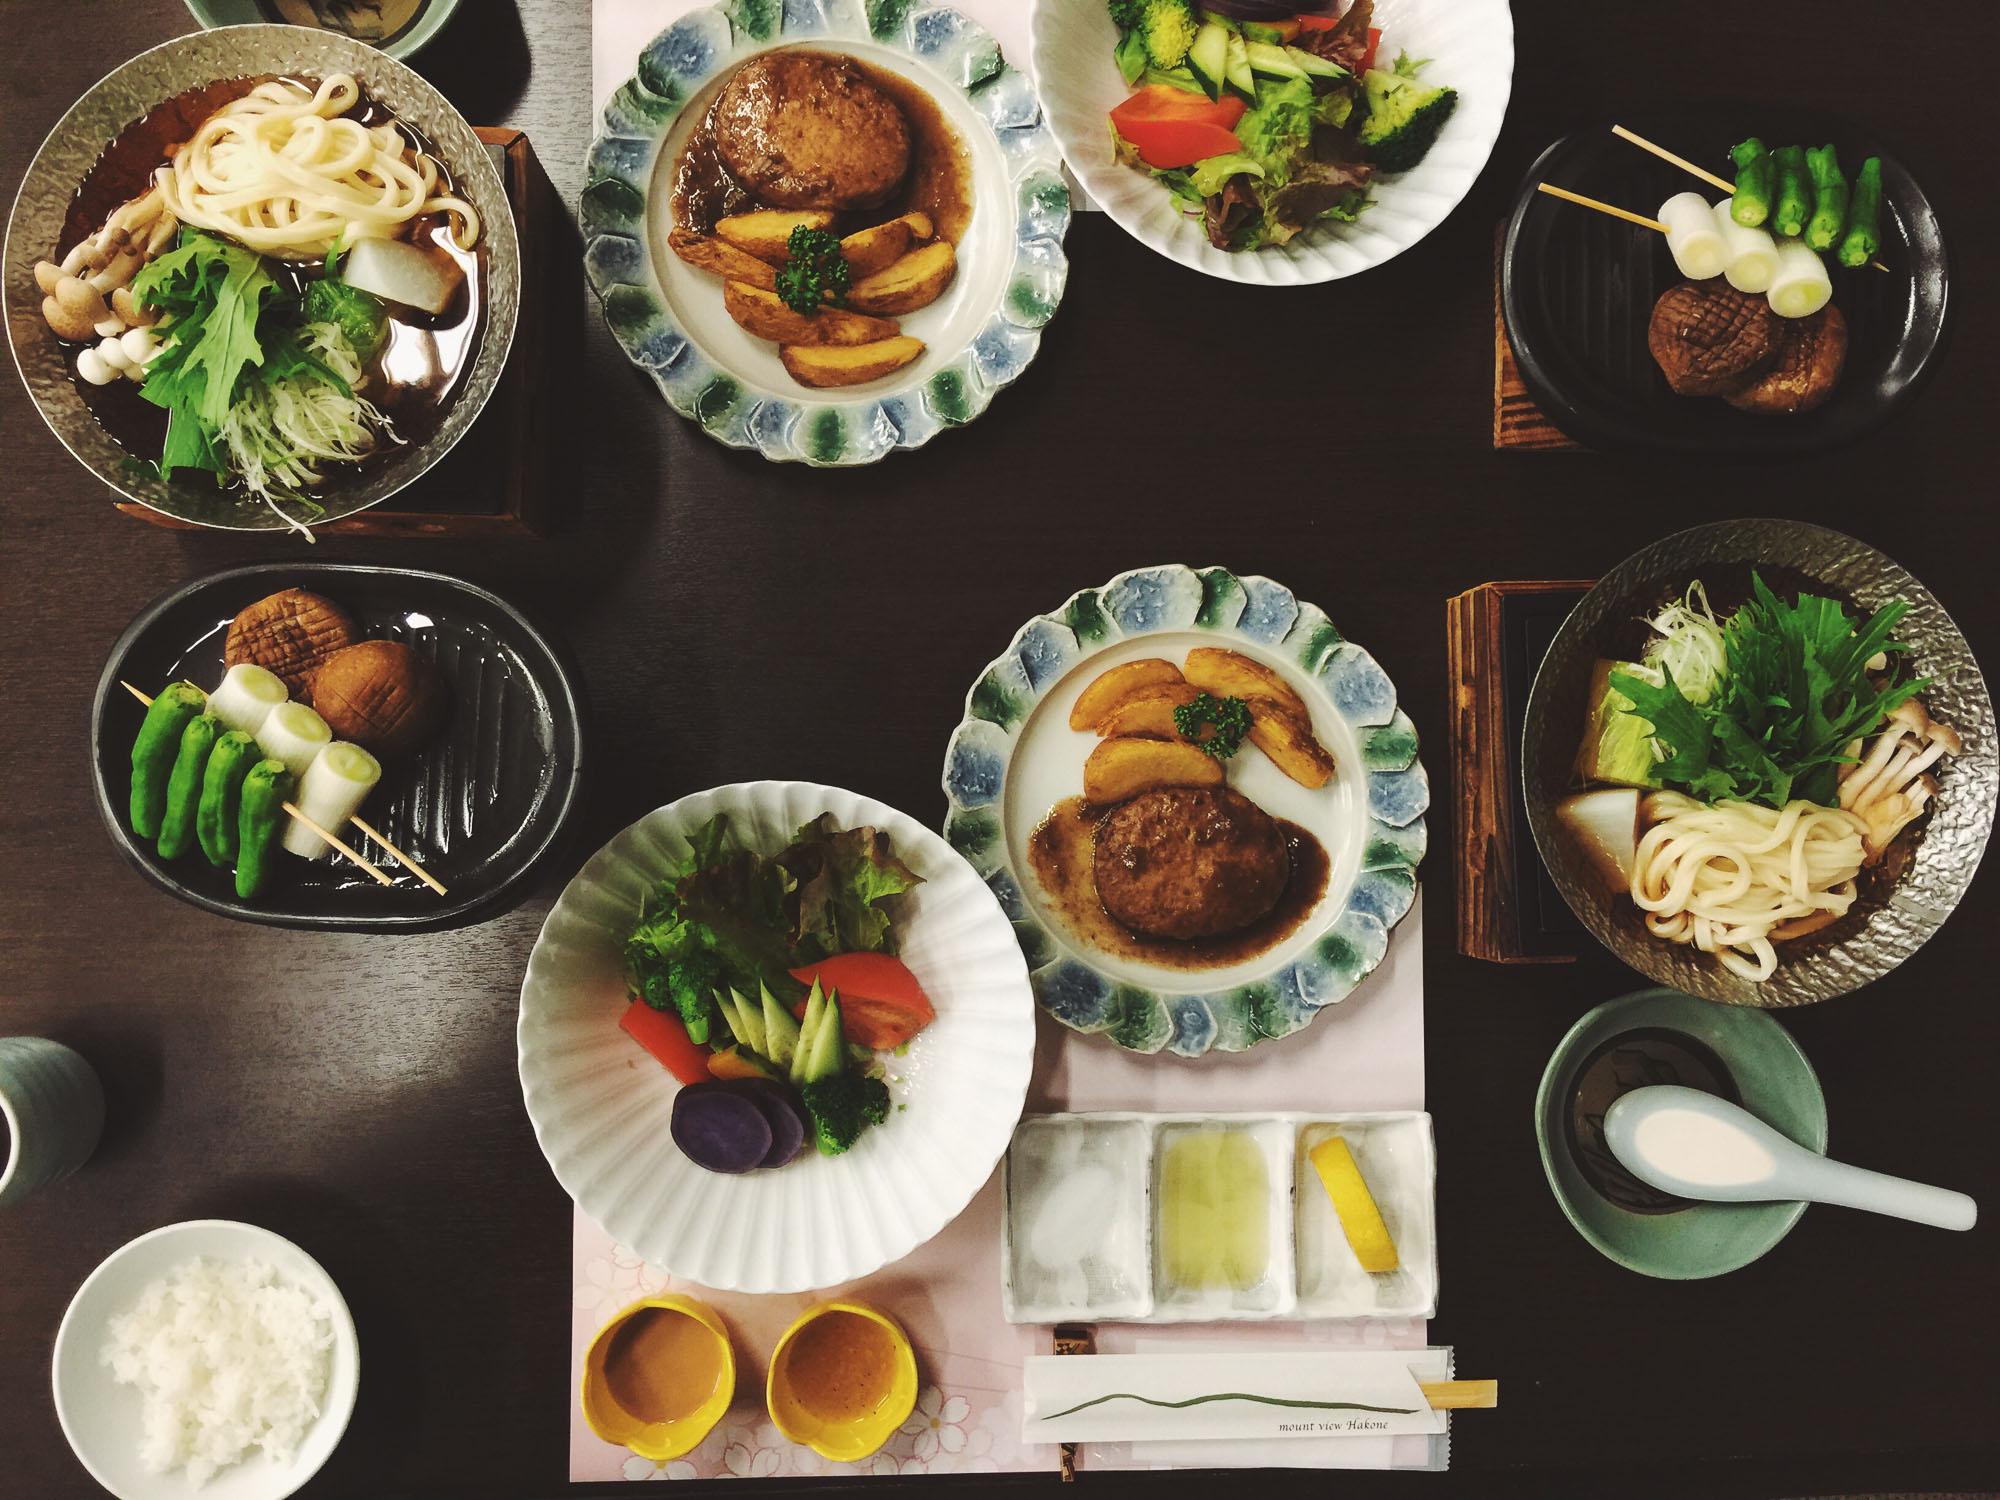 Japan itinerary - Hakone food